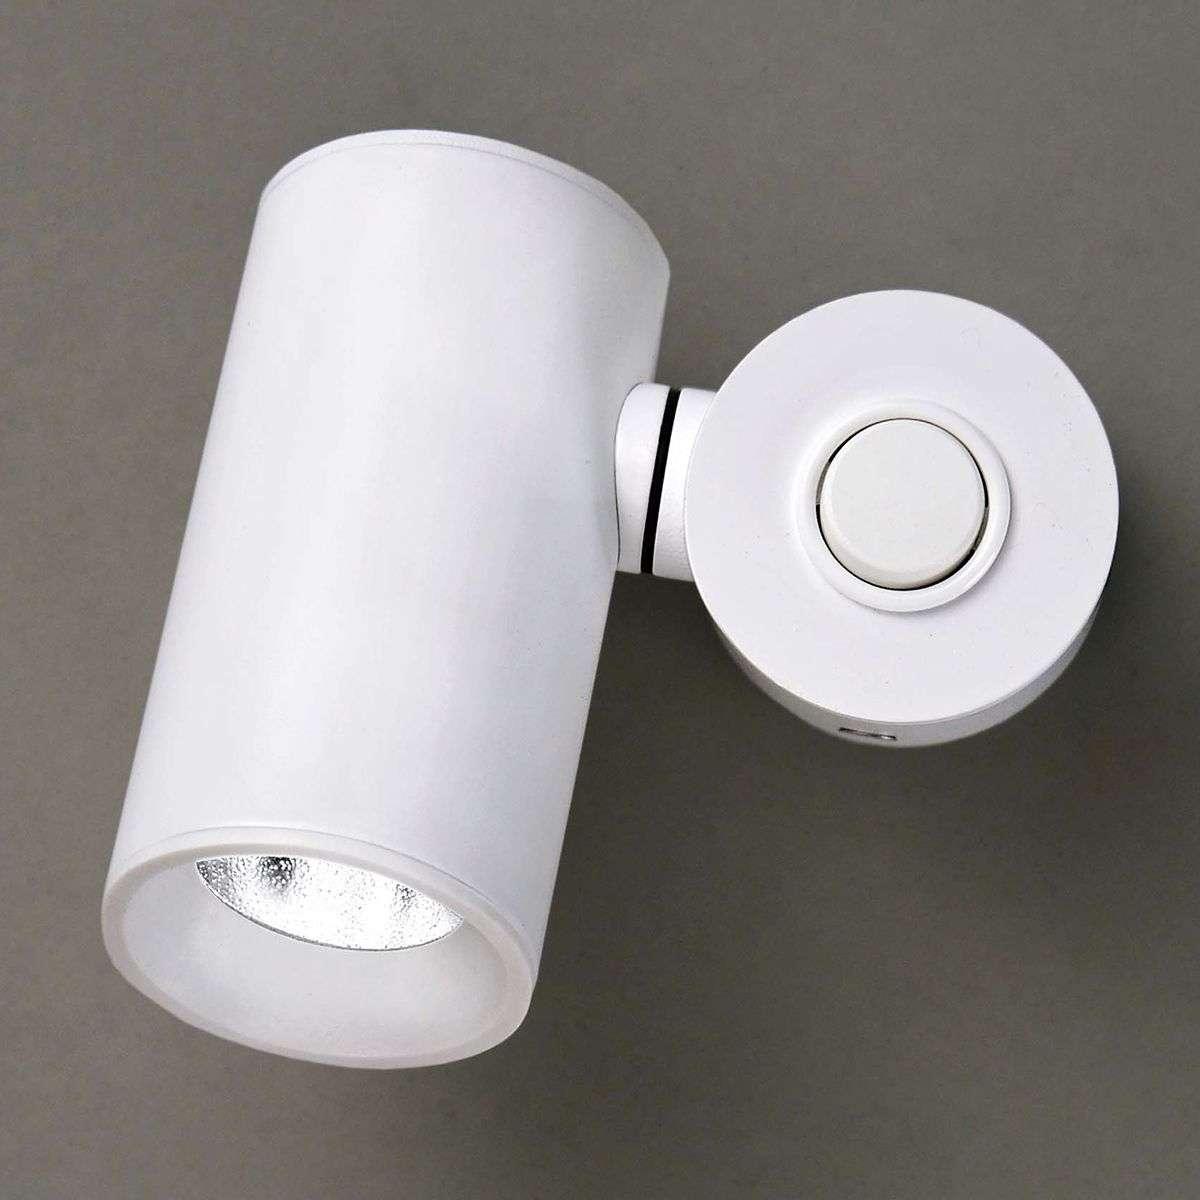 White dual-cylinder LED wall light Tub | Lights.ie